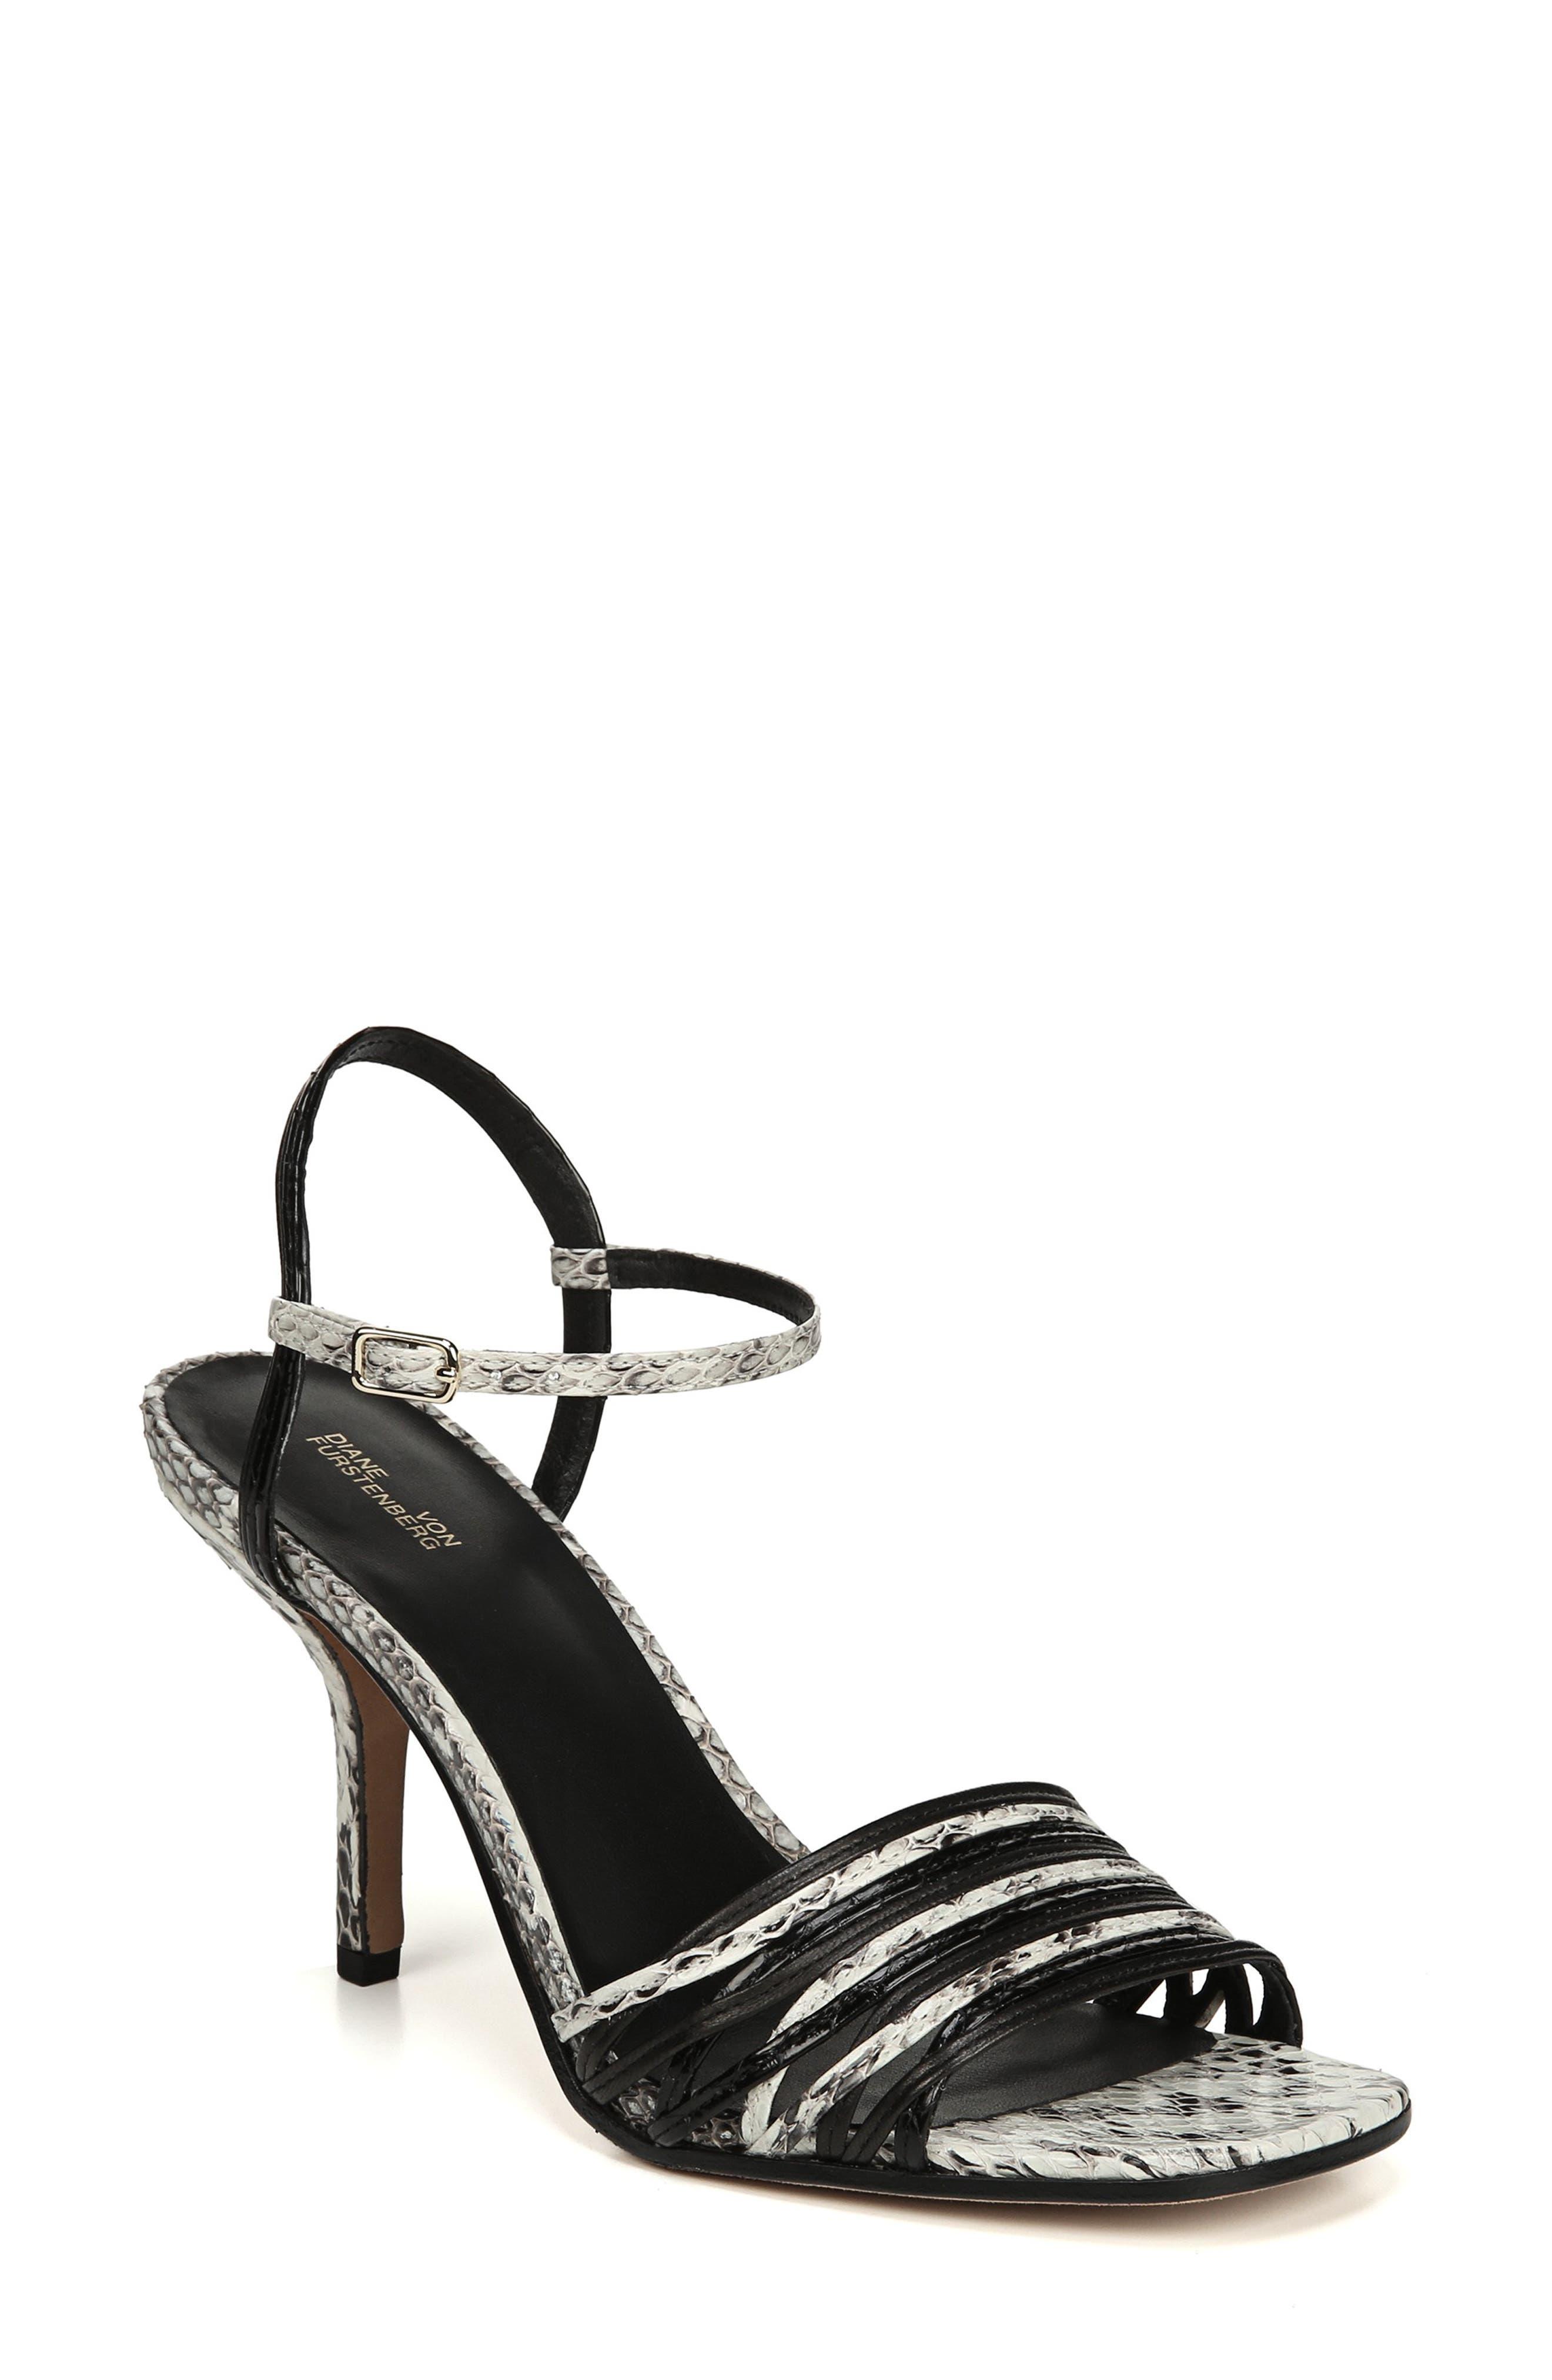 Federica Sandal,                         Main,                         color, BLACK/ SILVER